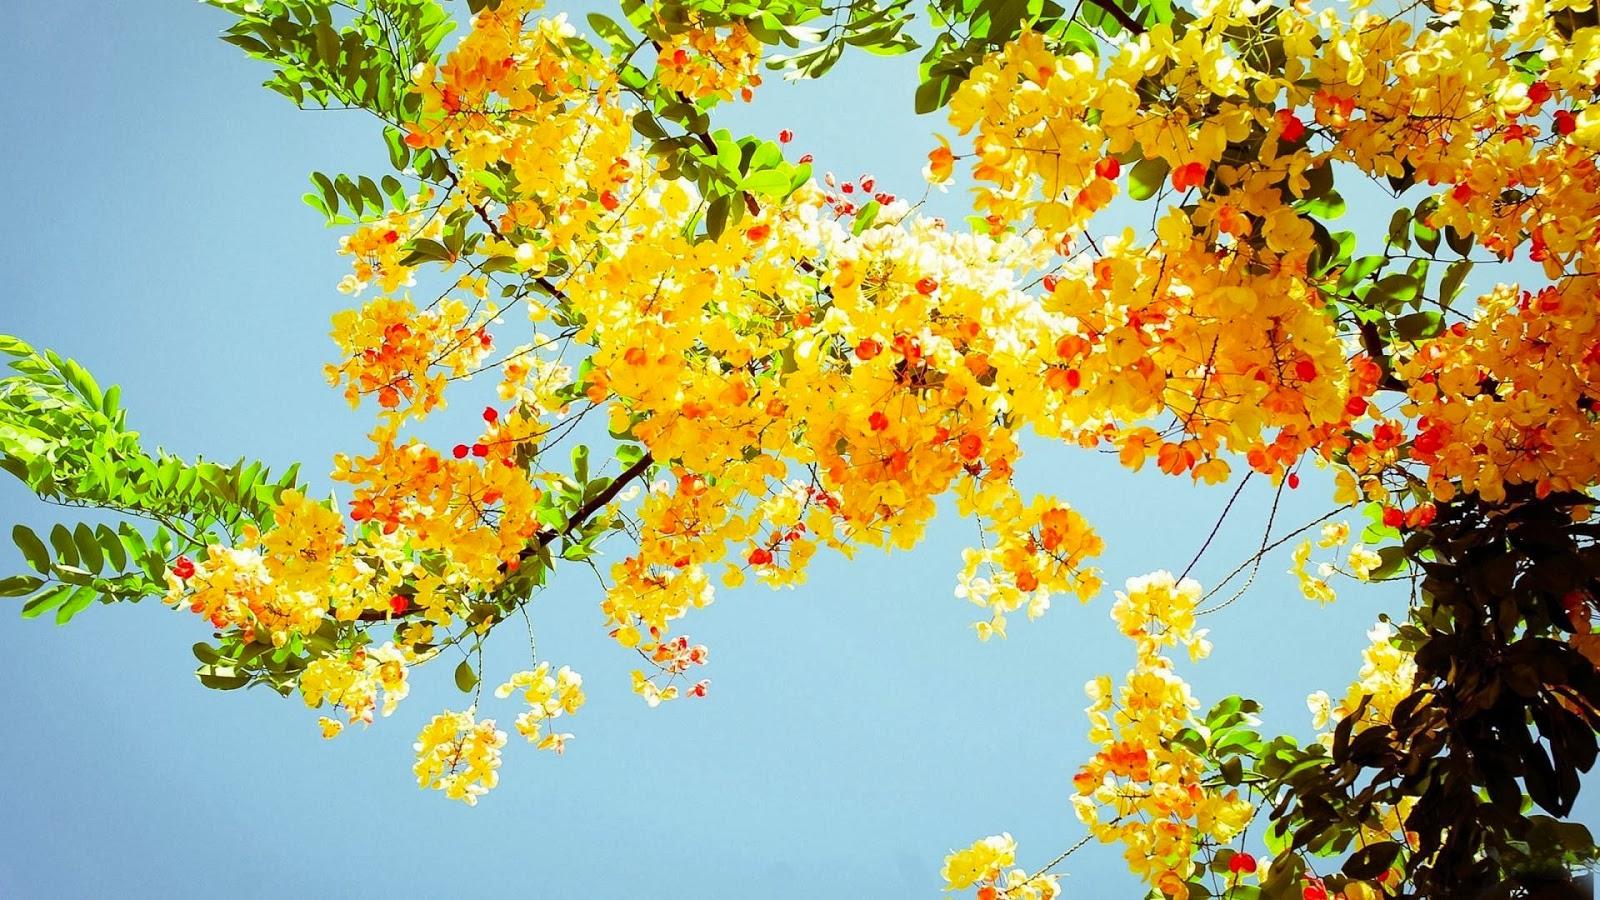 Summer flowers wallpaper in high resolution for Get Summer 1600x900